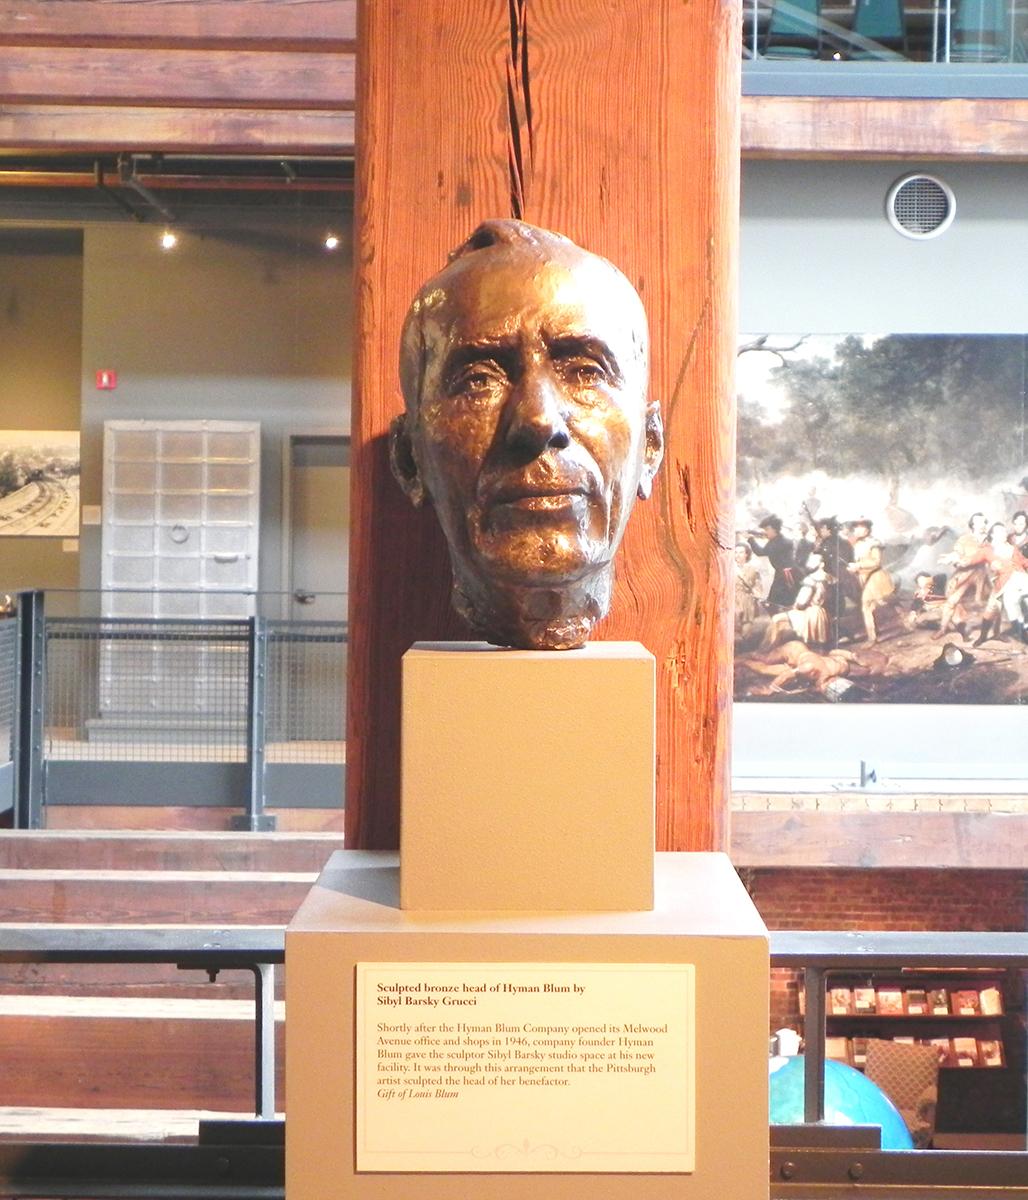 Sibyl Barsky, Bust of Hyman Blum, bronze, c. 1946. Heinz History Center museum collections. Gift of Lois Blum.